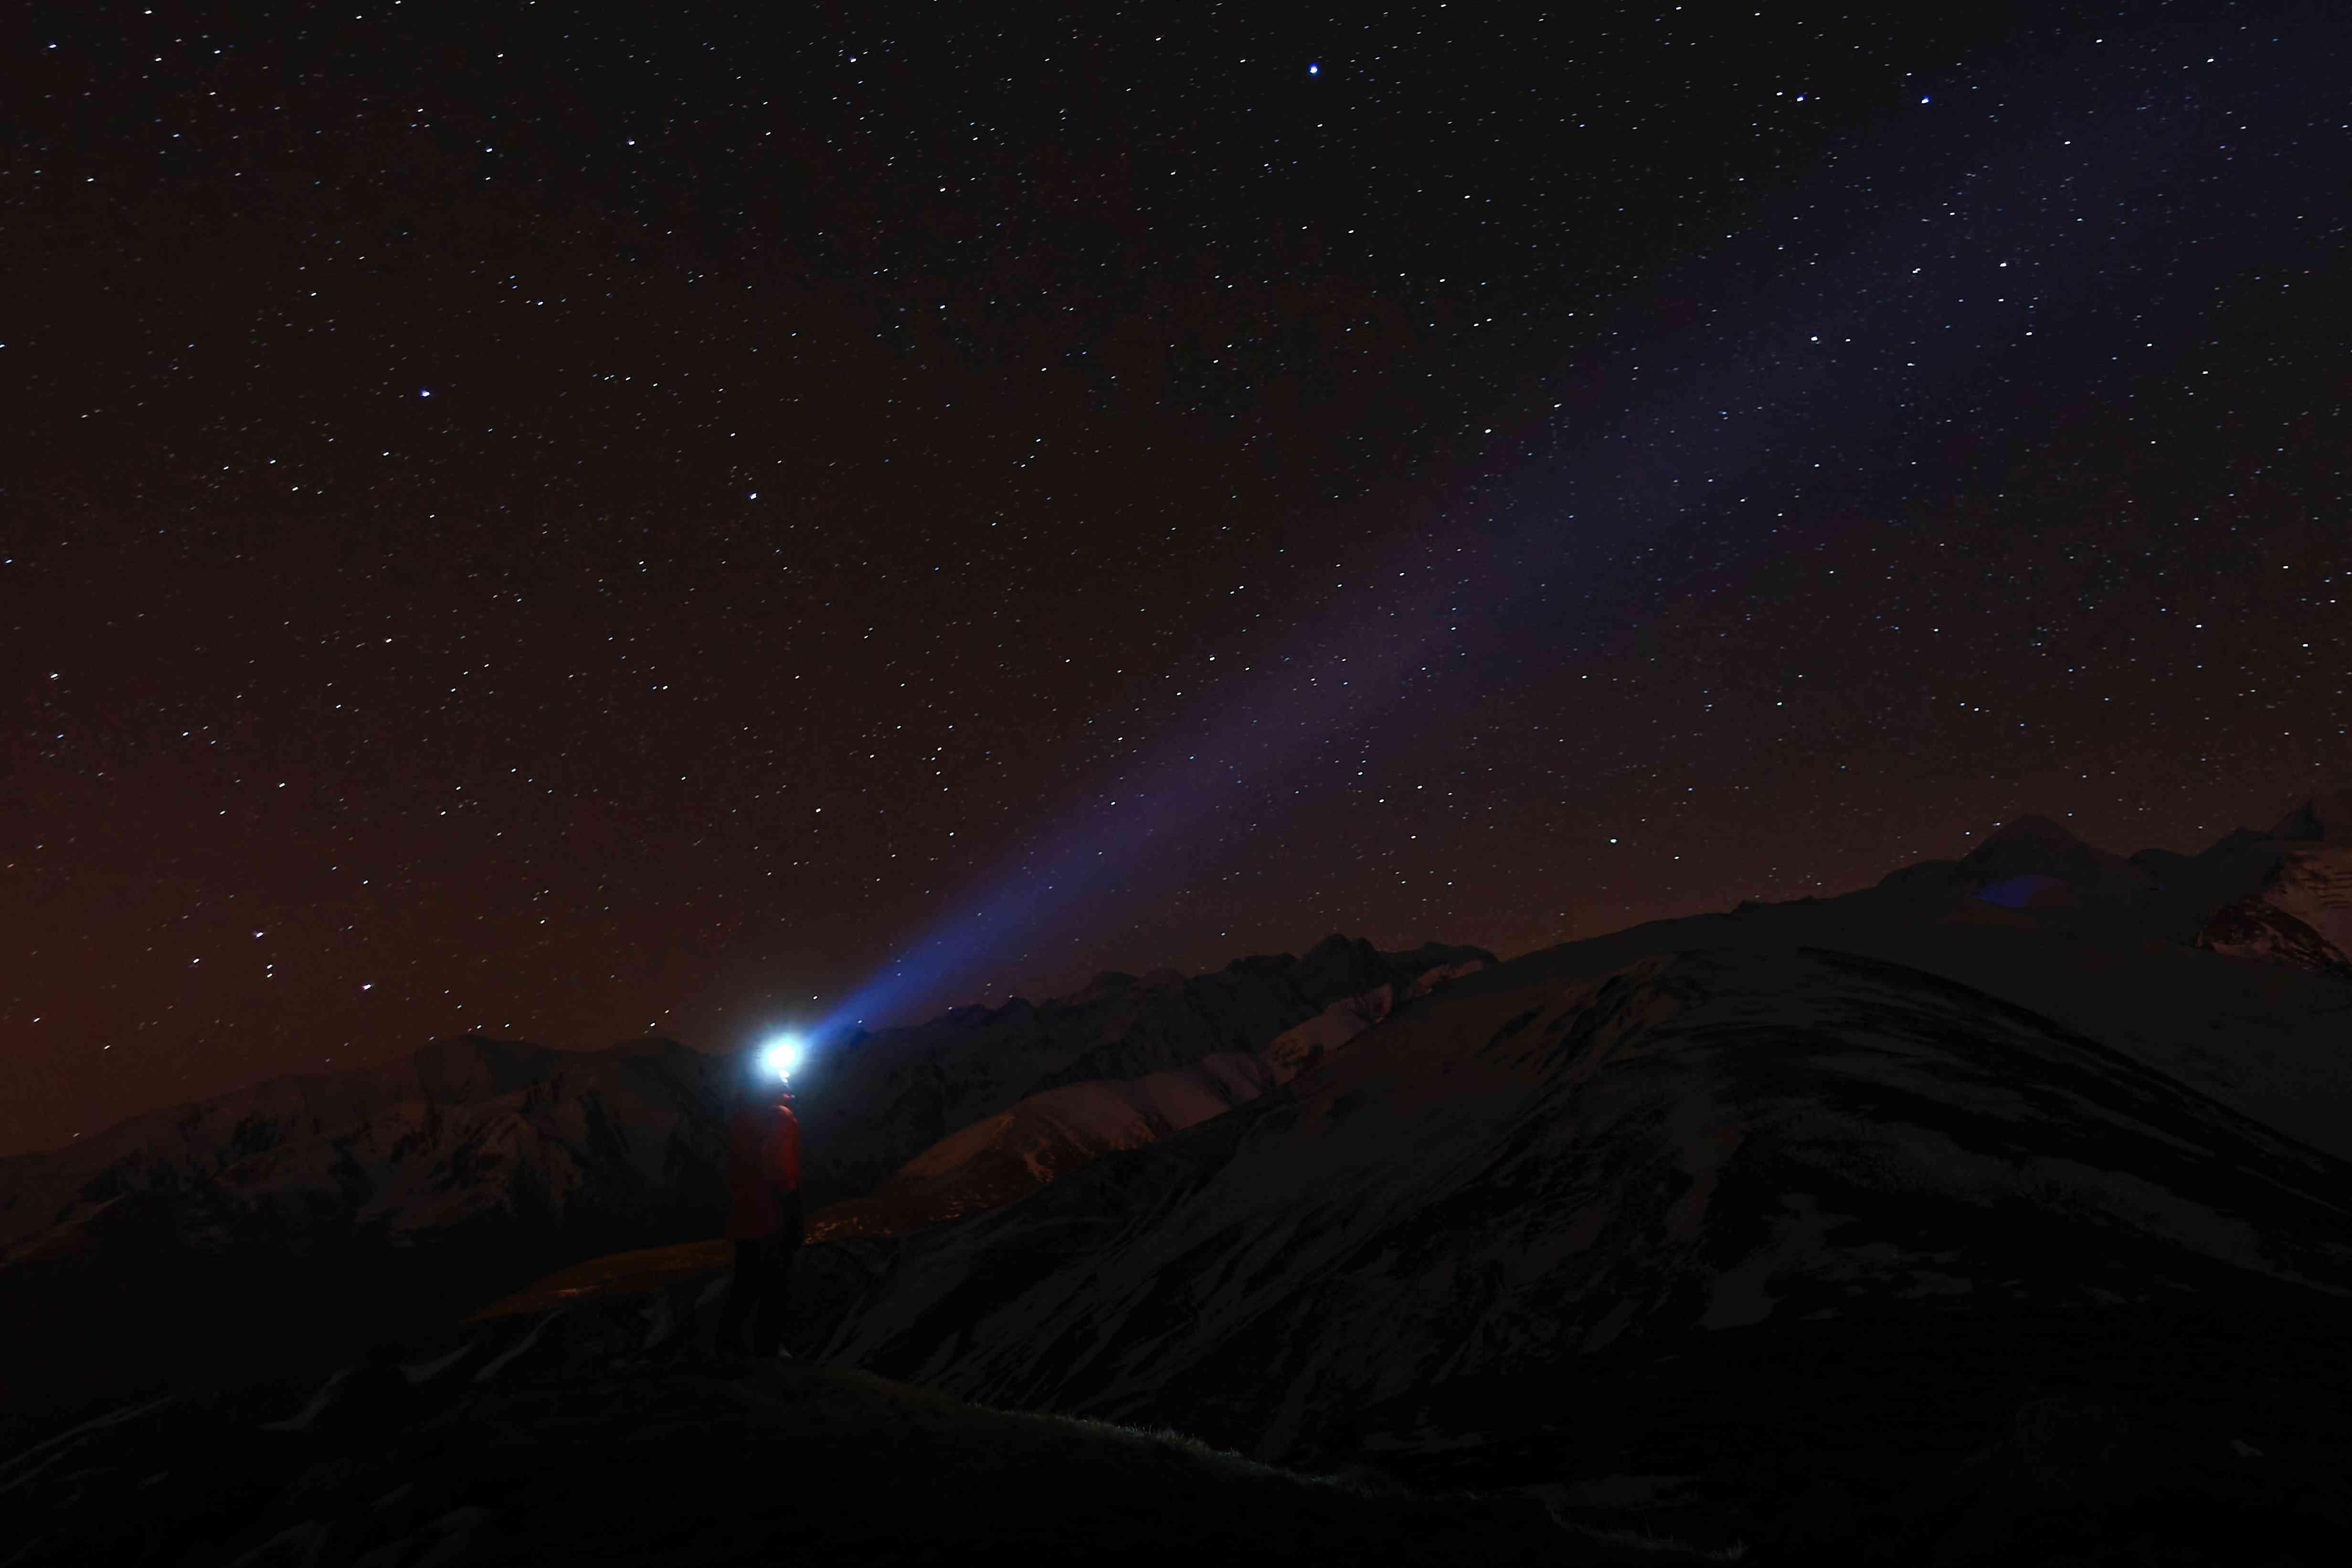 Light shining in the night sky